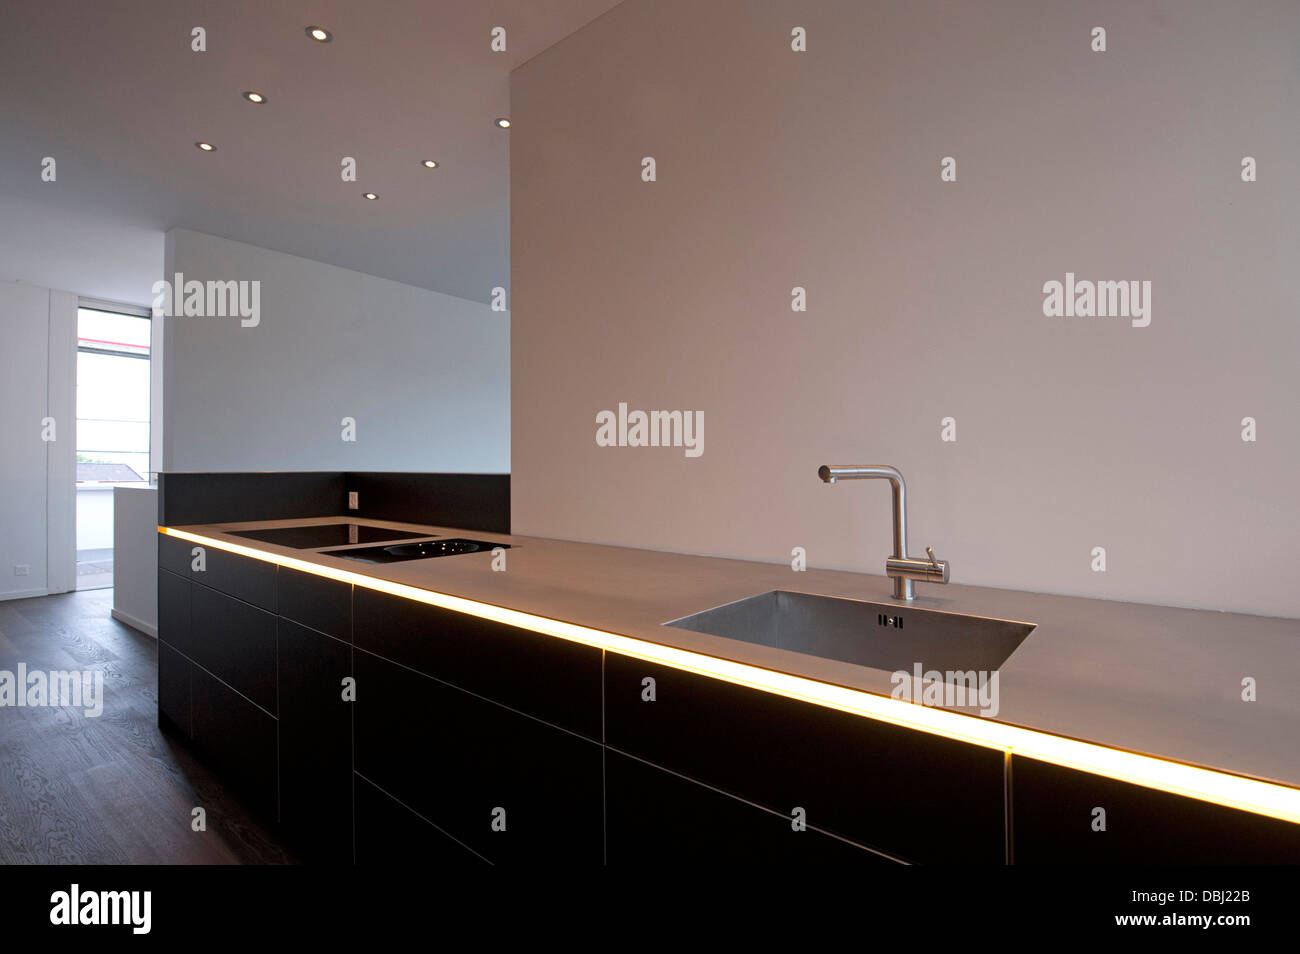 Küche Photos & Küche Images - Alamy